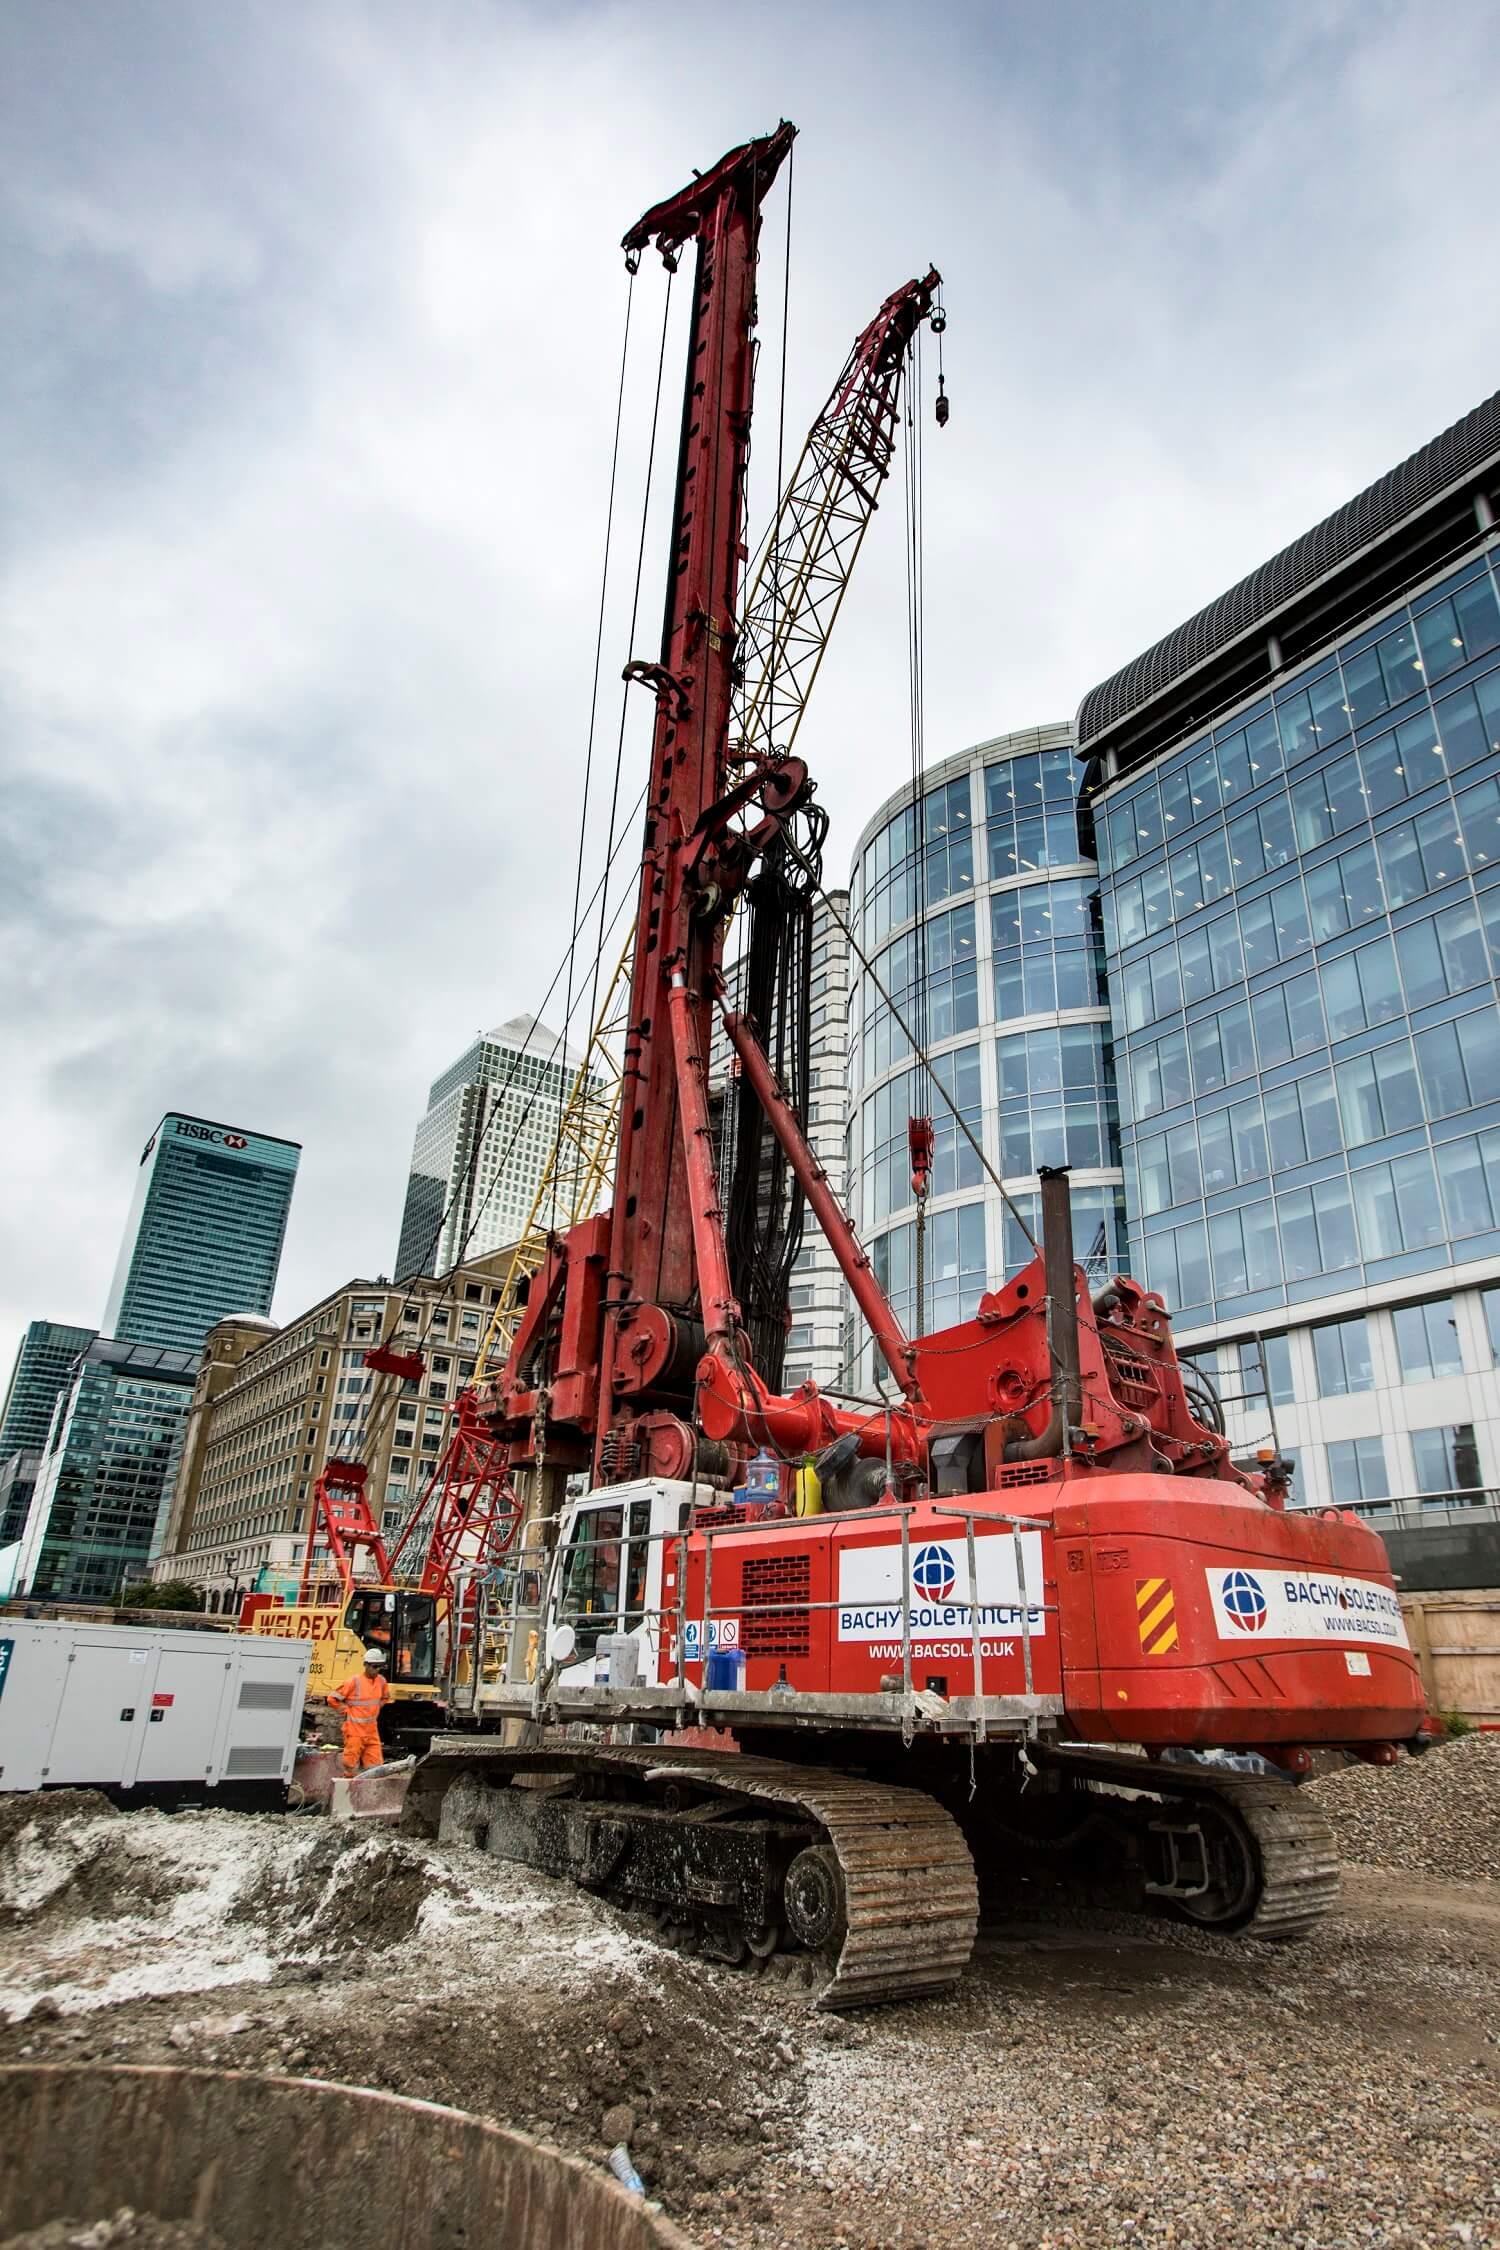 Retaining Wall Solution - Secant Retaining Wall LDA Piling - Spire London (6)